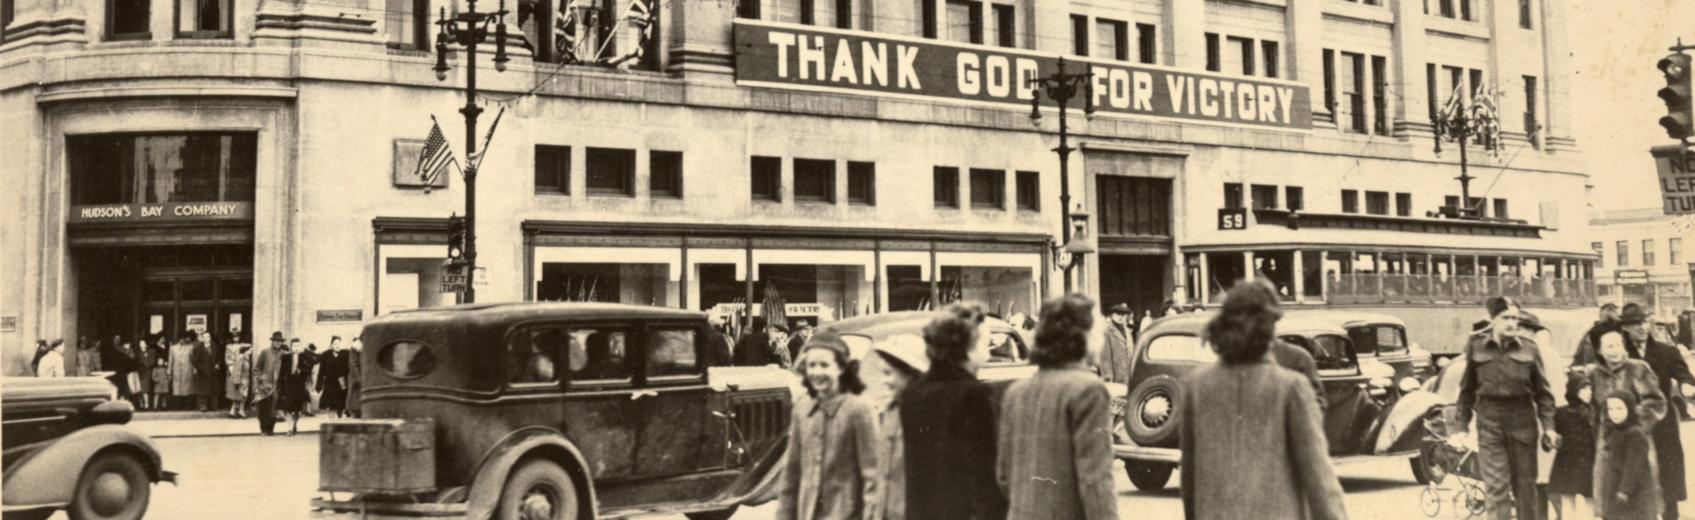 University of Winnipeg Archives. Thank God for Victory, 1945 (URC 10-28).